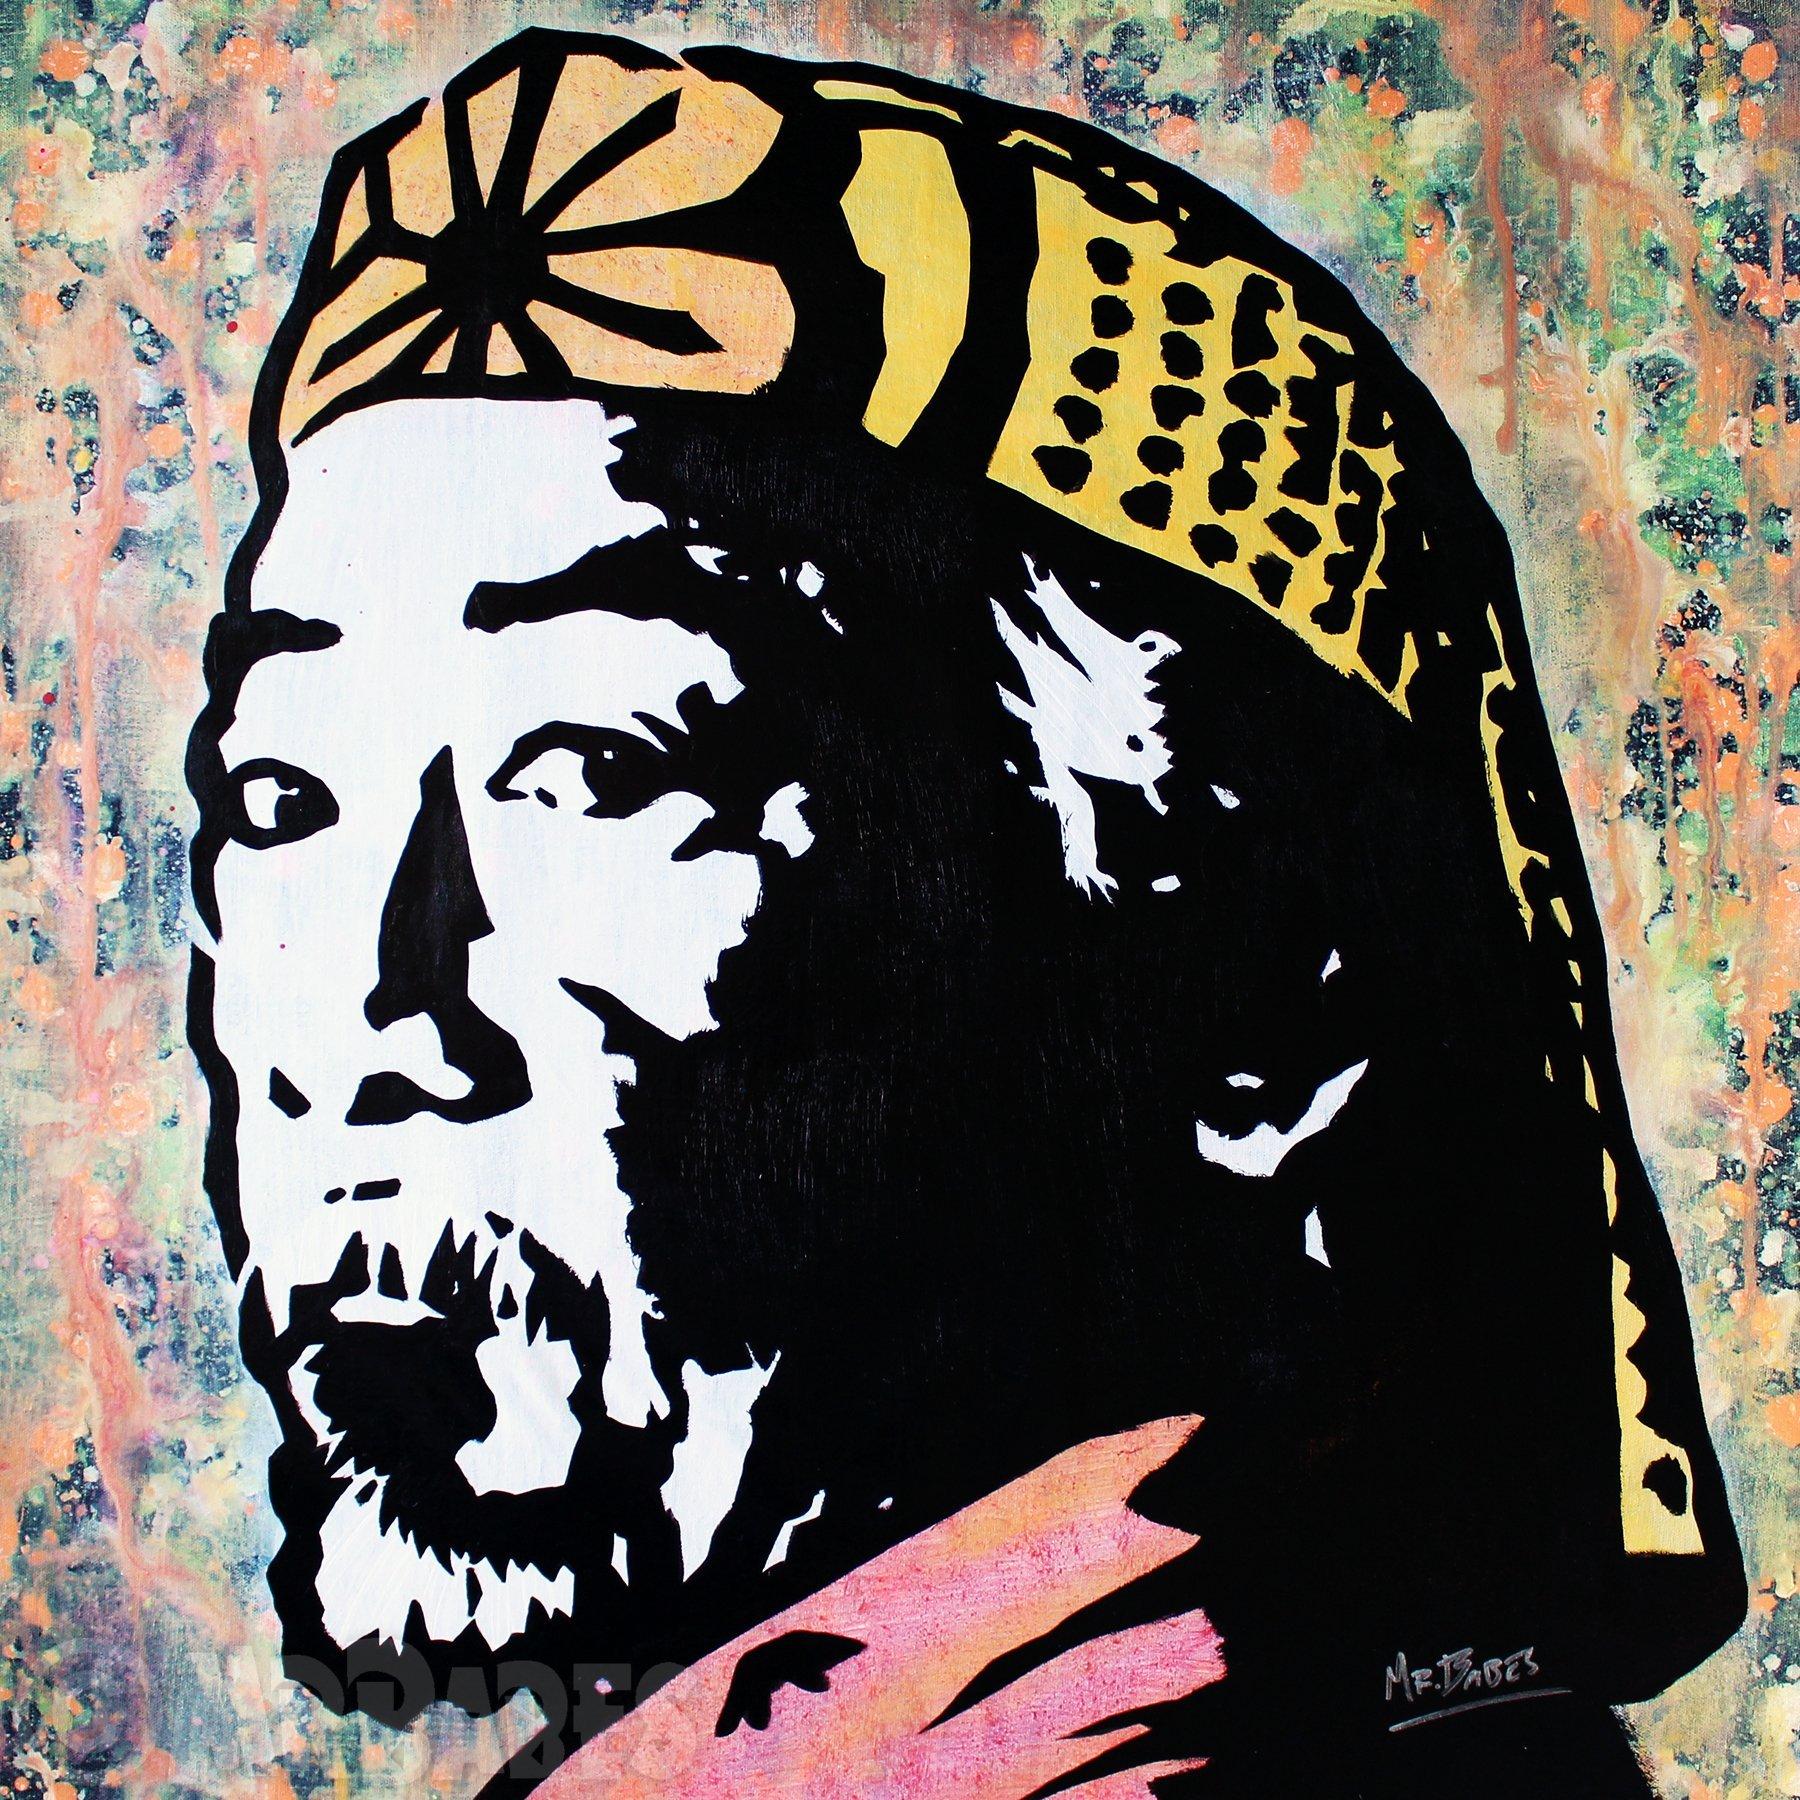 MR.BABES - ''The Karate Kid: Mr. Miyagi (Pat Morita)'' - Original Pop Art Painting - Movie Portrait